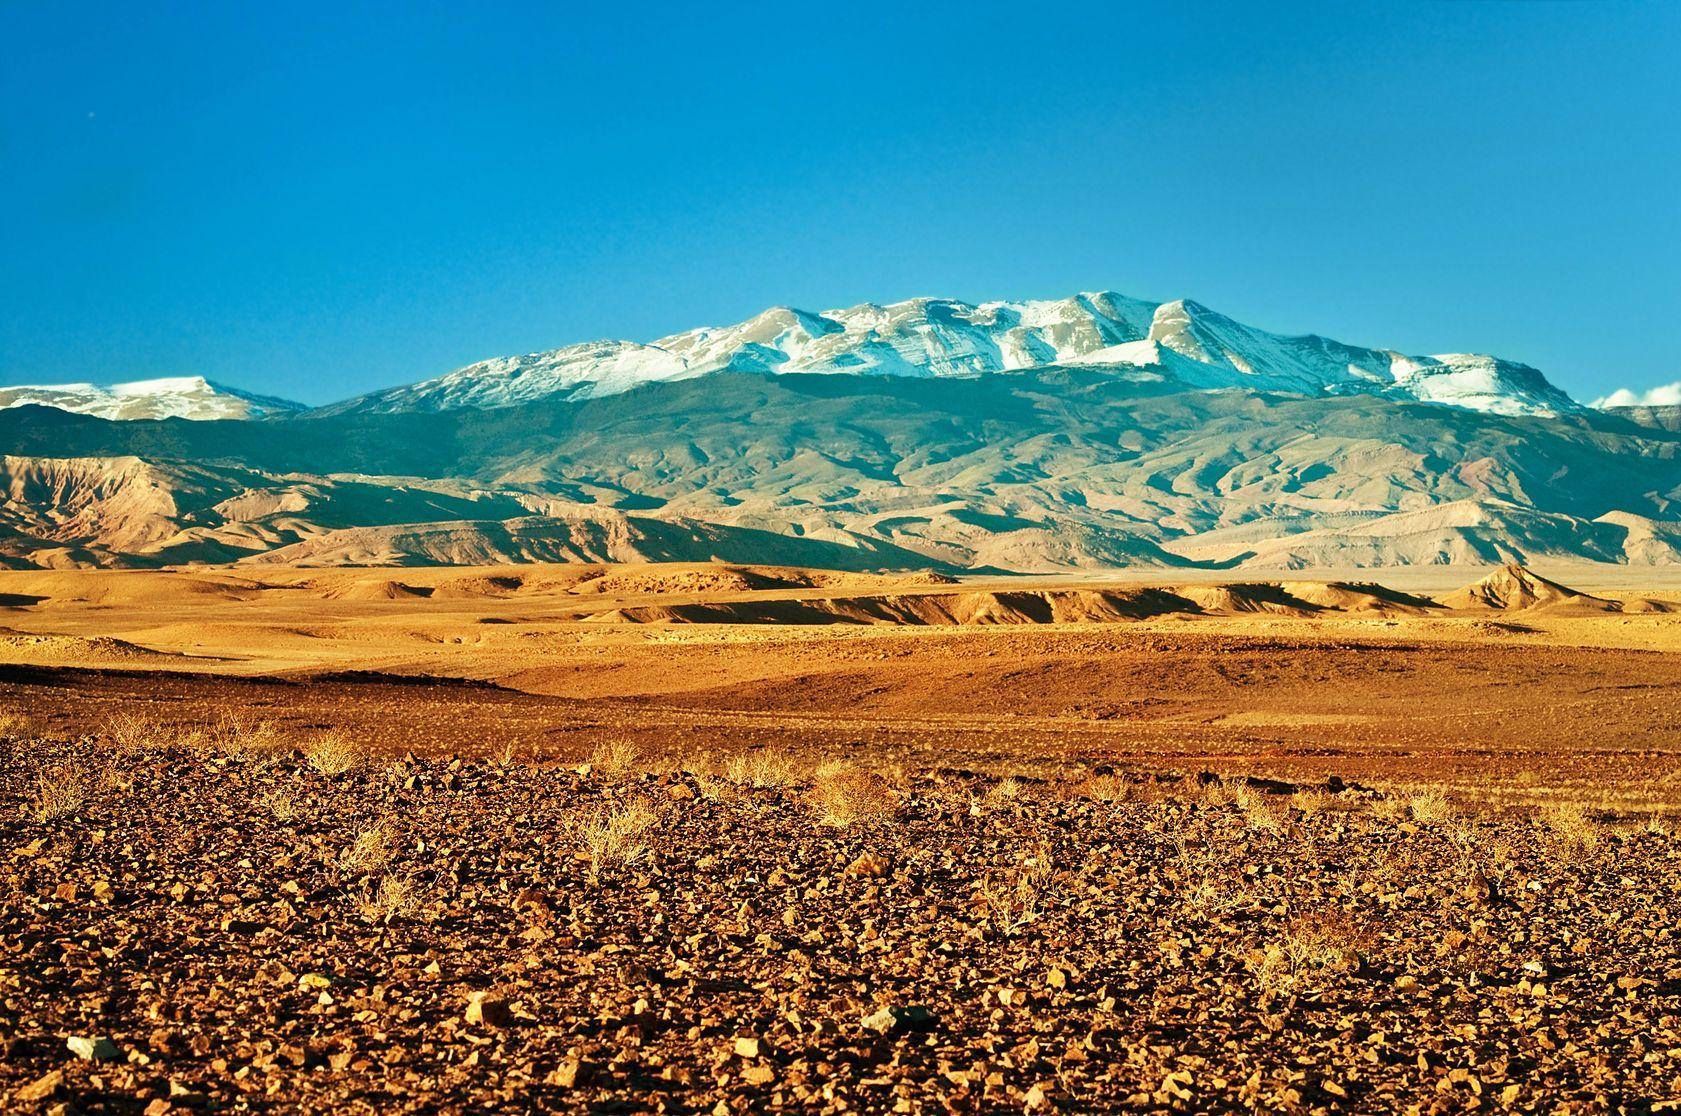 Krajina v Maroku | seqoya/123RF.com